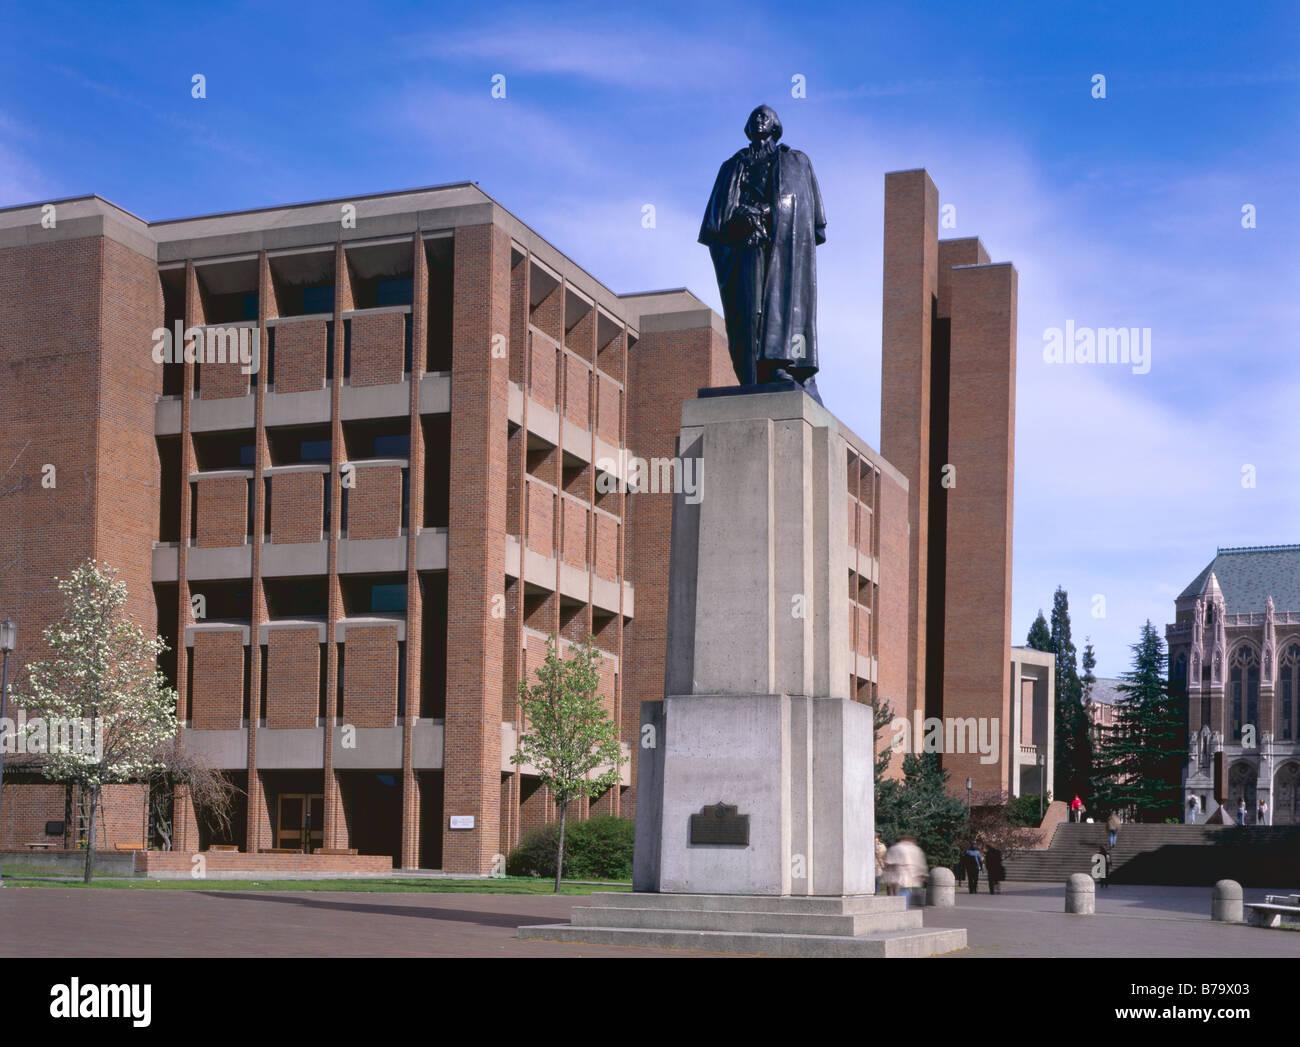 Under Graduate Stockfotos & Under Graduate Bilder - Alamy